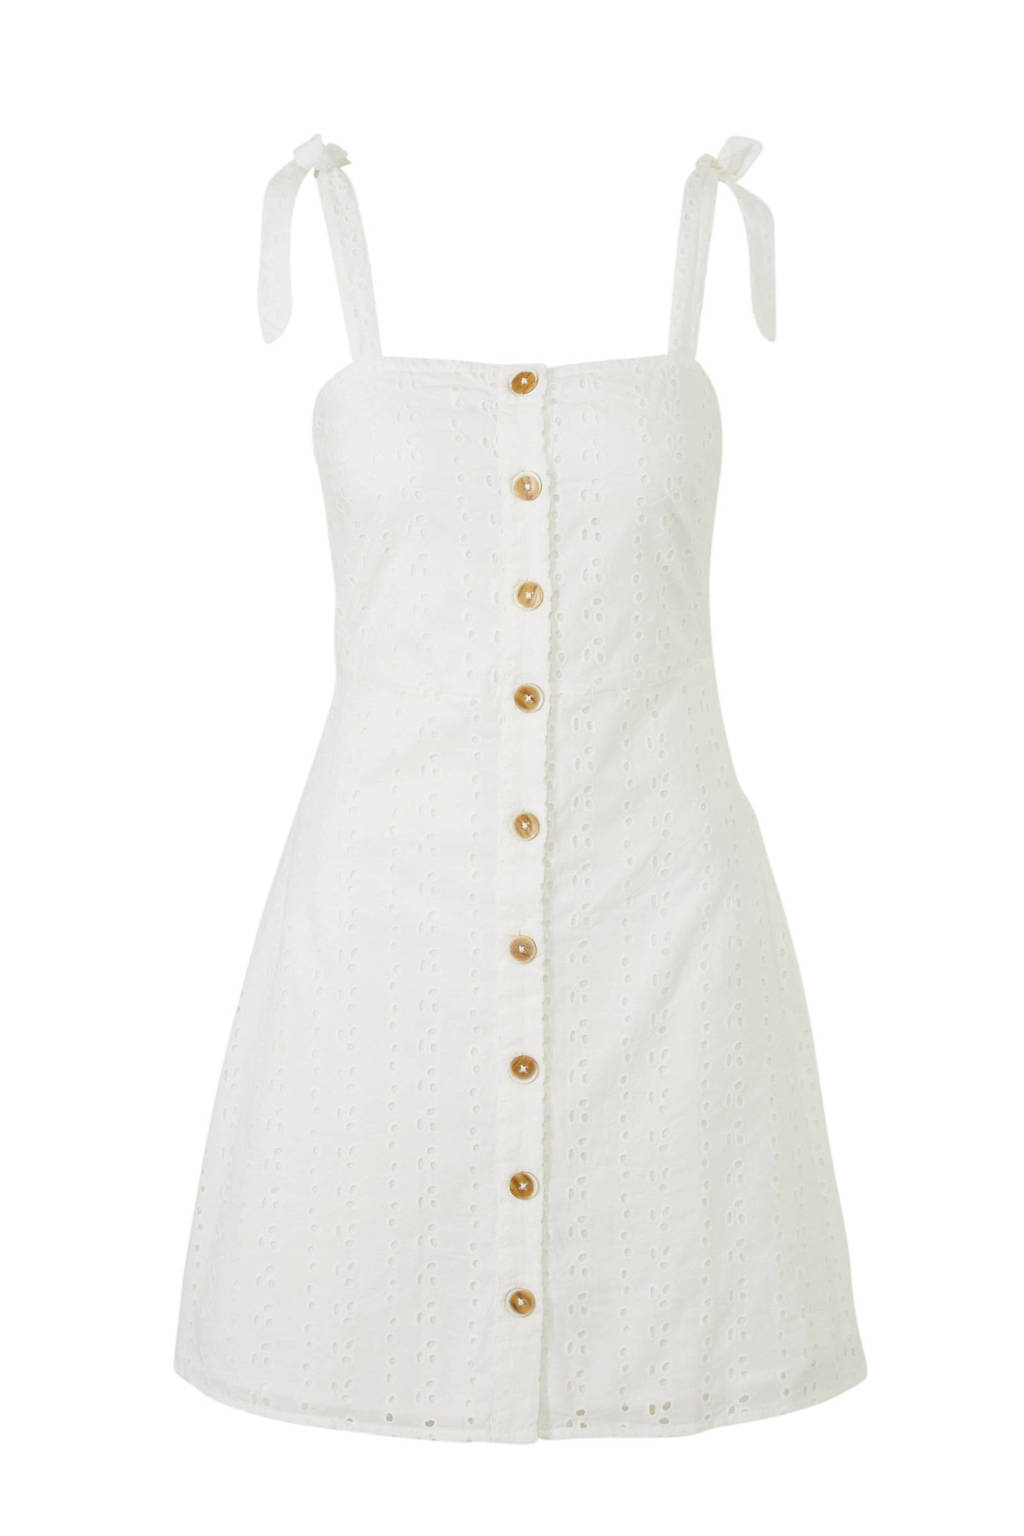 Mango jurk met broderie wit, Wit